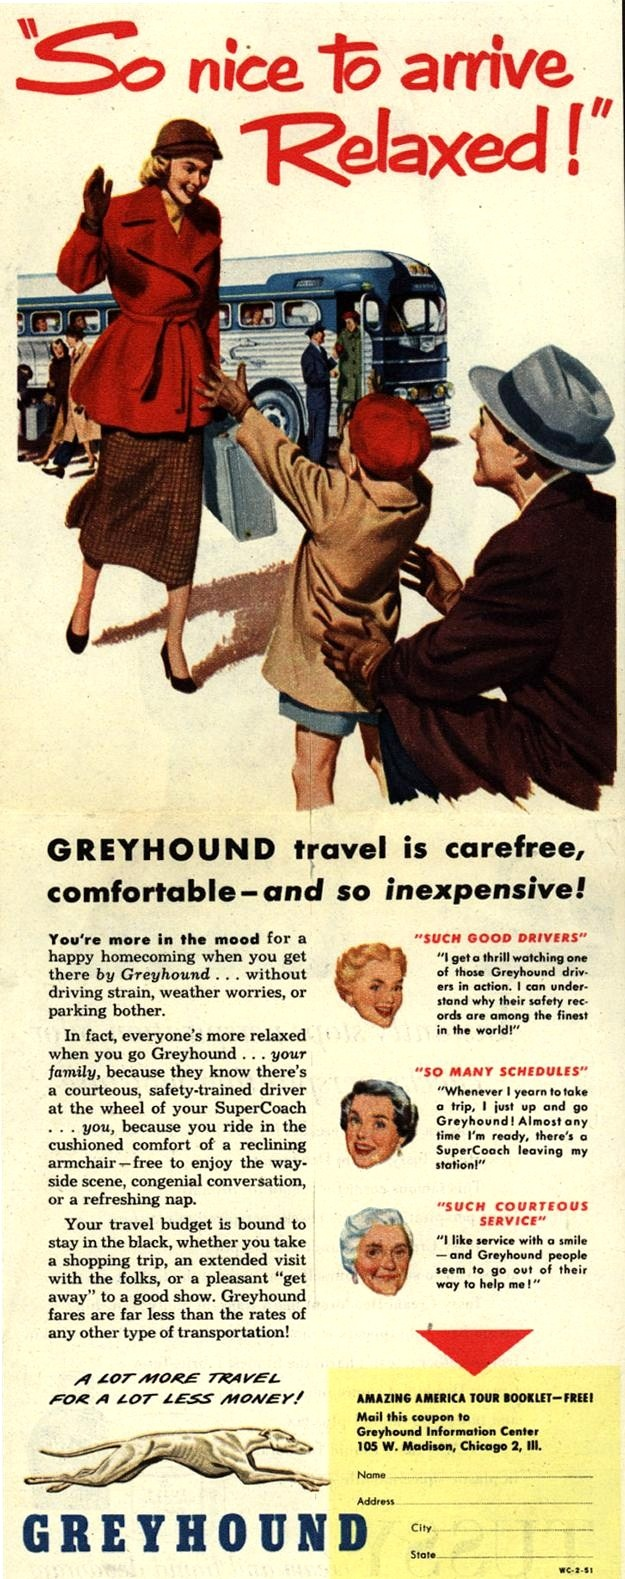 Vintage Greyhound Ad - 1951 !!!!!¡¡¡¡¡¡¡¡@@@@@.....http://www.pinterest.com/stardustretro/vintage-vacations/